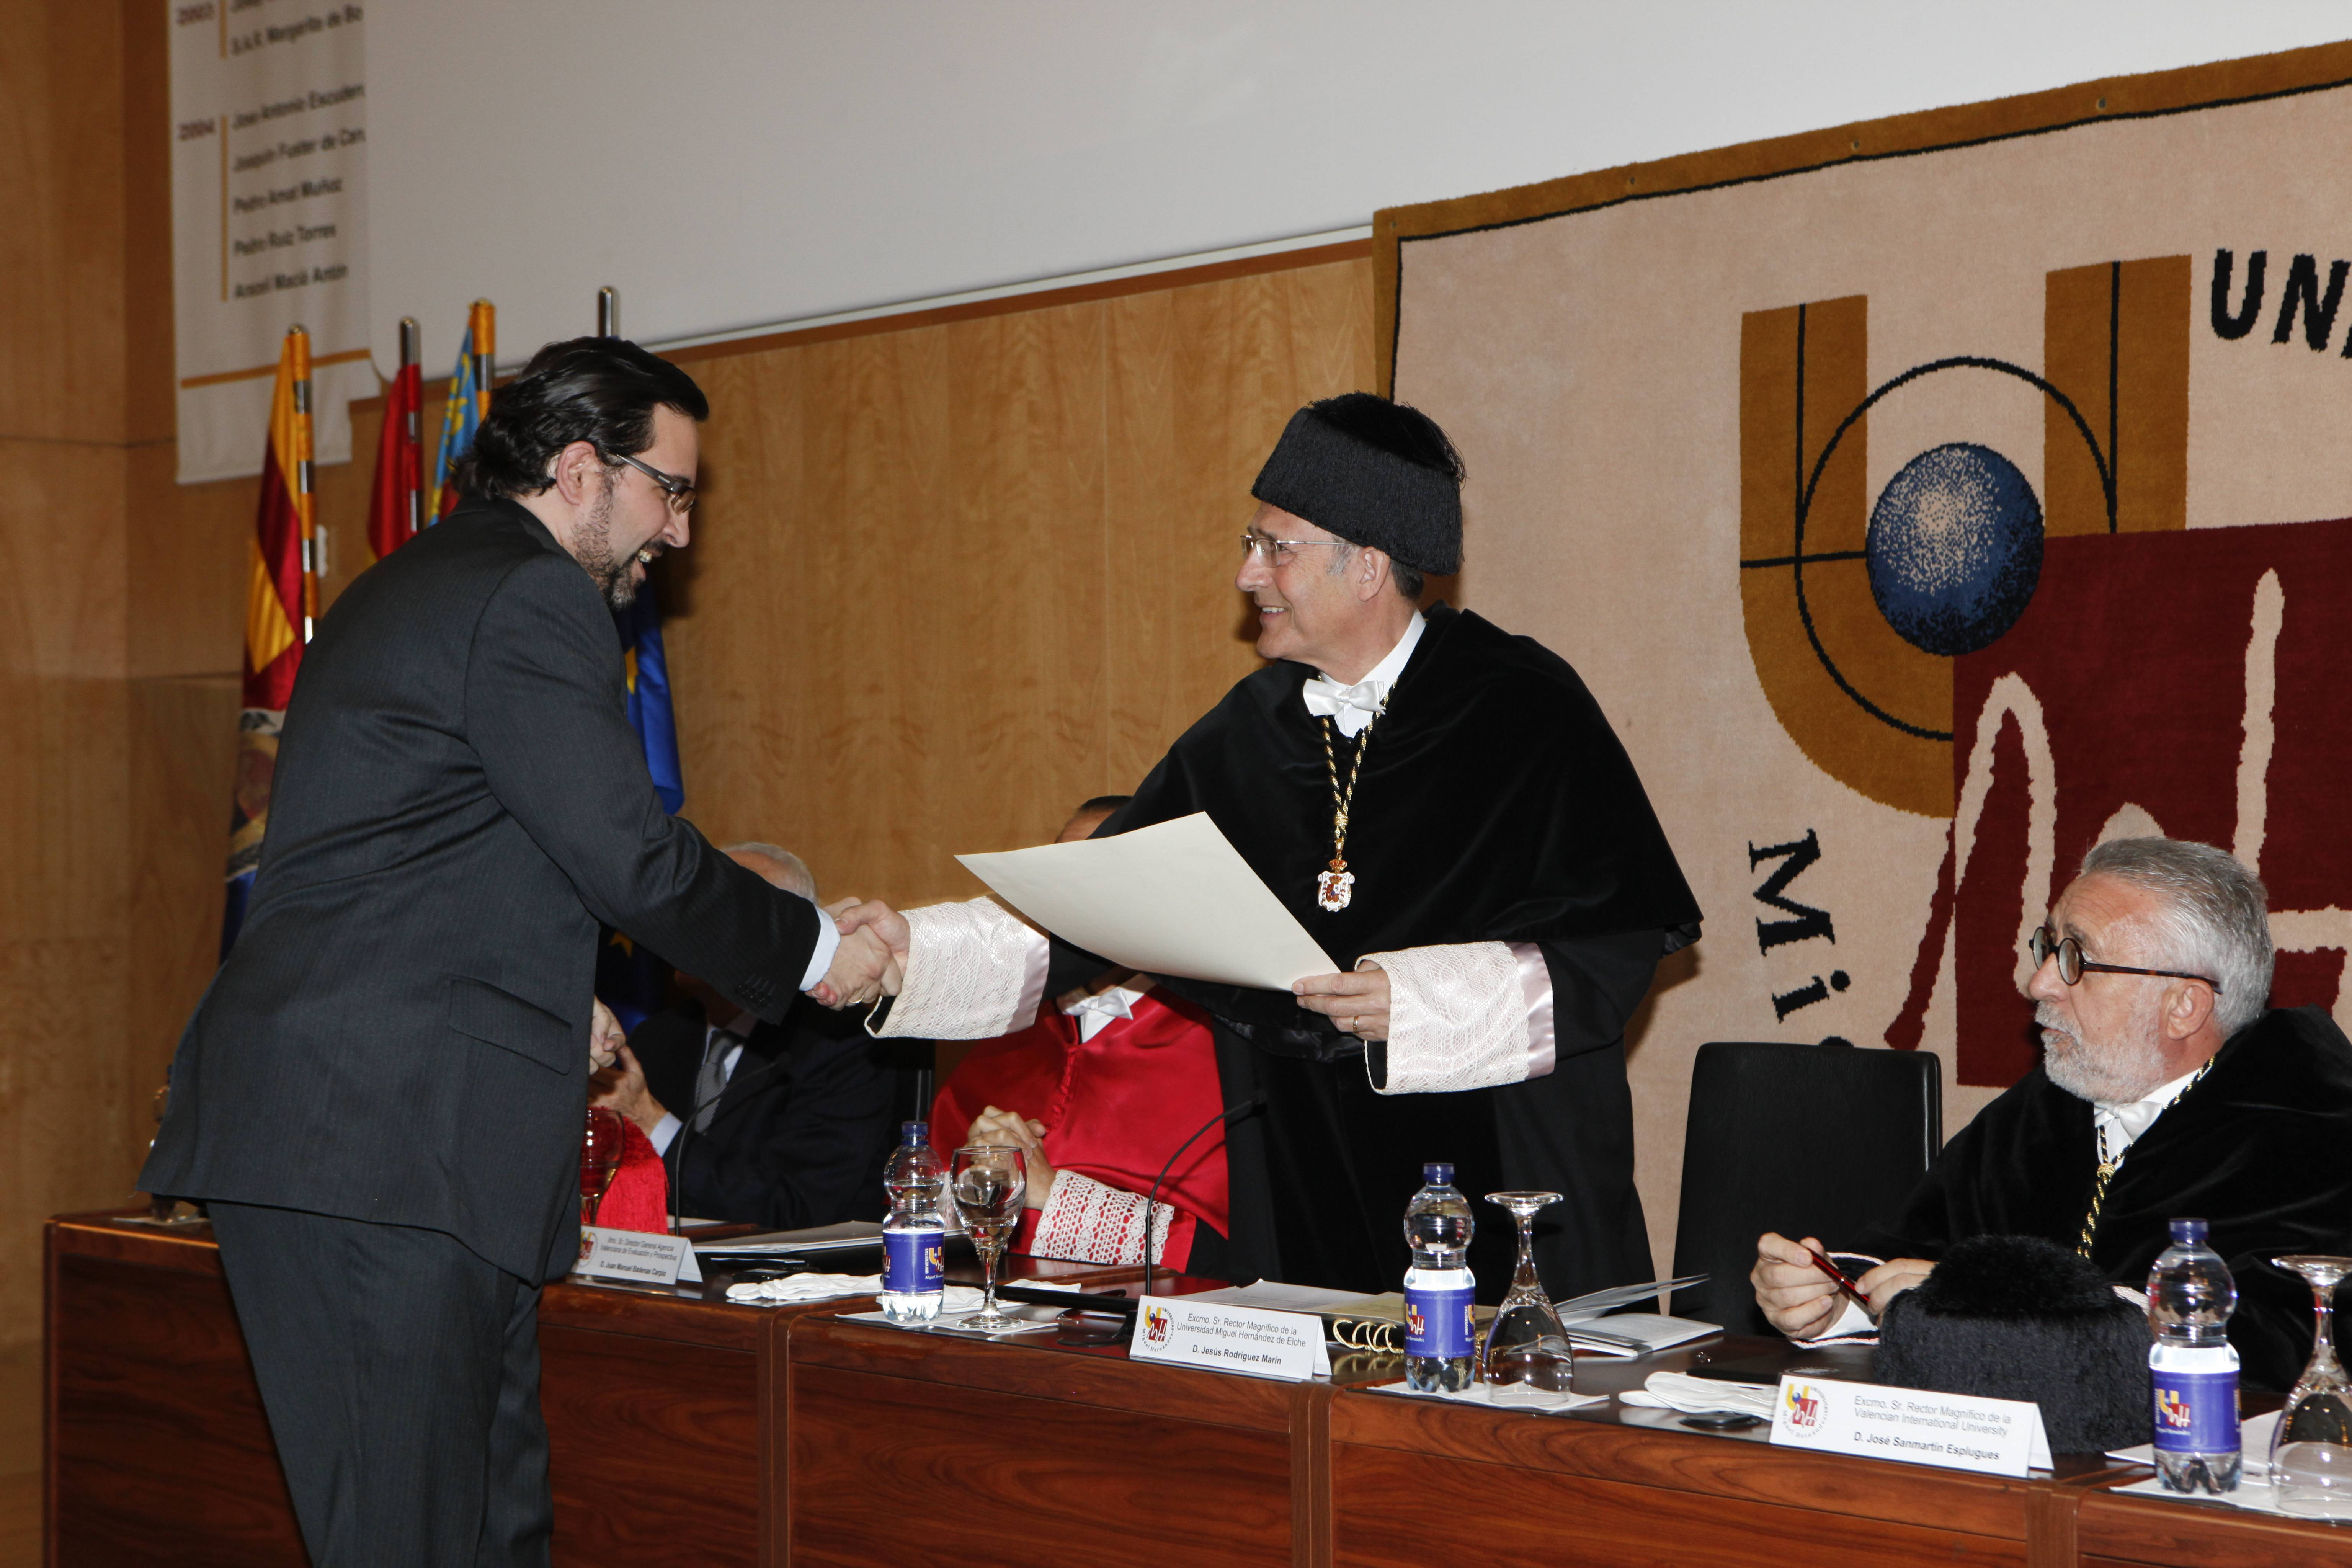 doctor-honoris-causa-luis-gamir_mg_1059.jpg